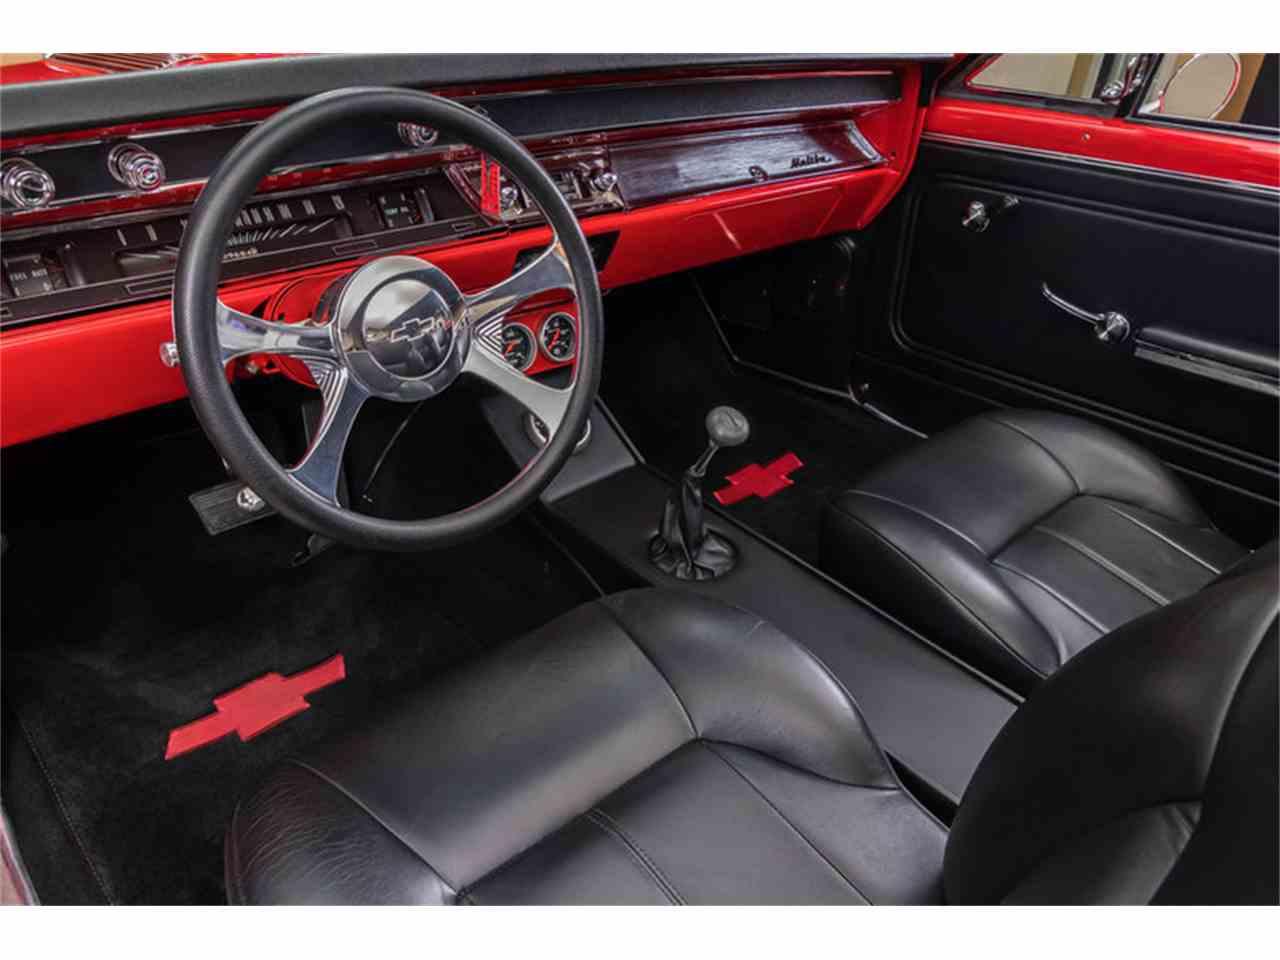 1967 Chevrolet Chevelle for Sale | ClassicCars.com | CC-1082178